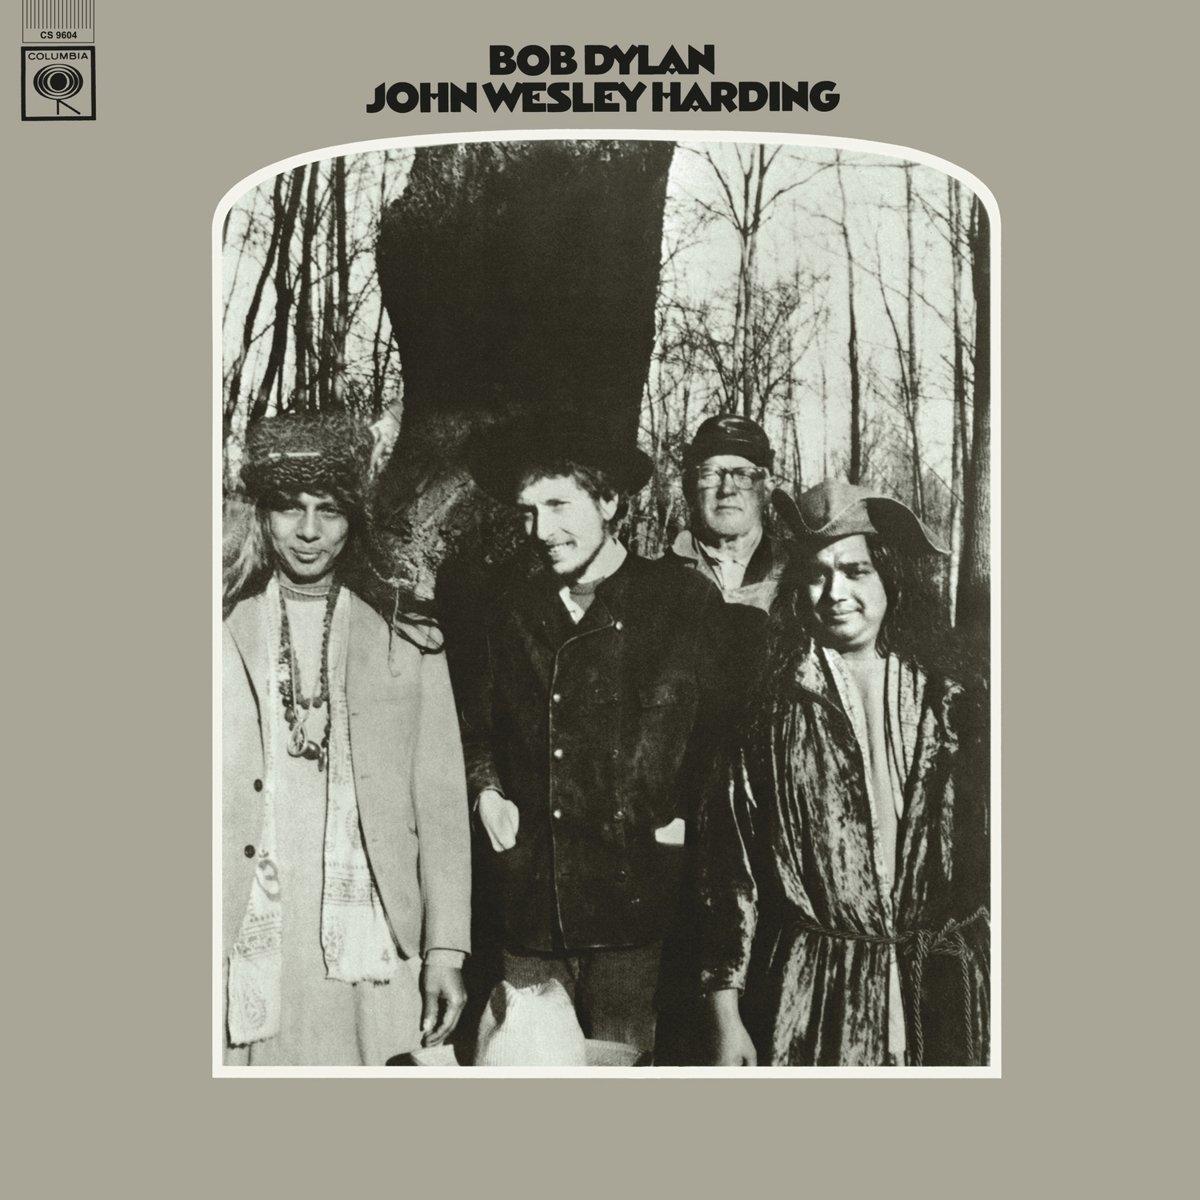 John Wesley Harding - Vinyl